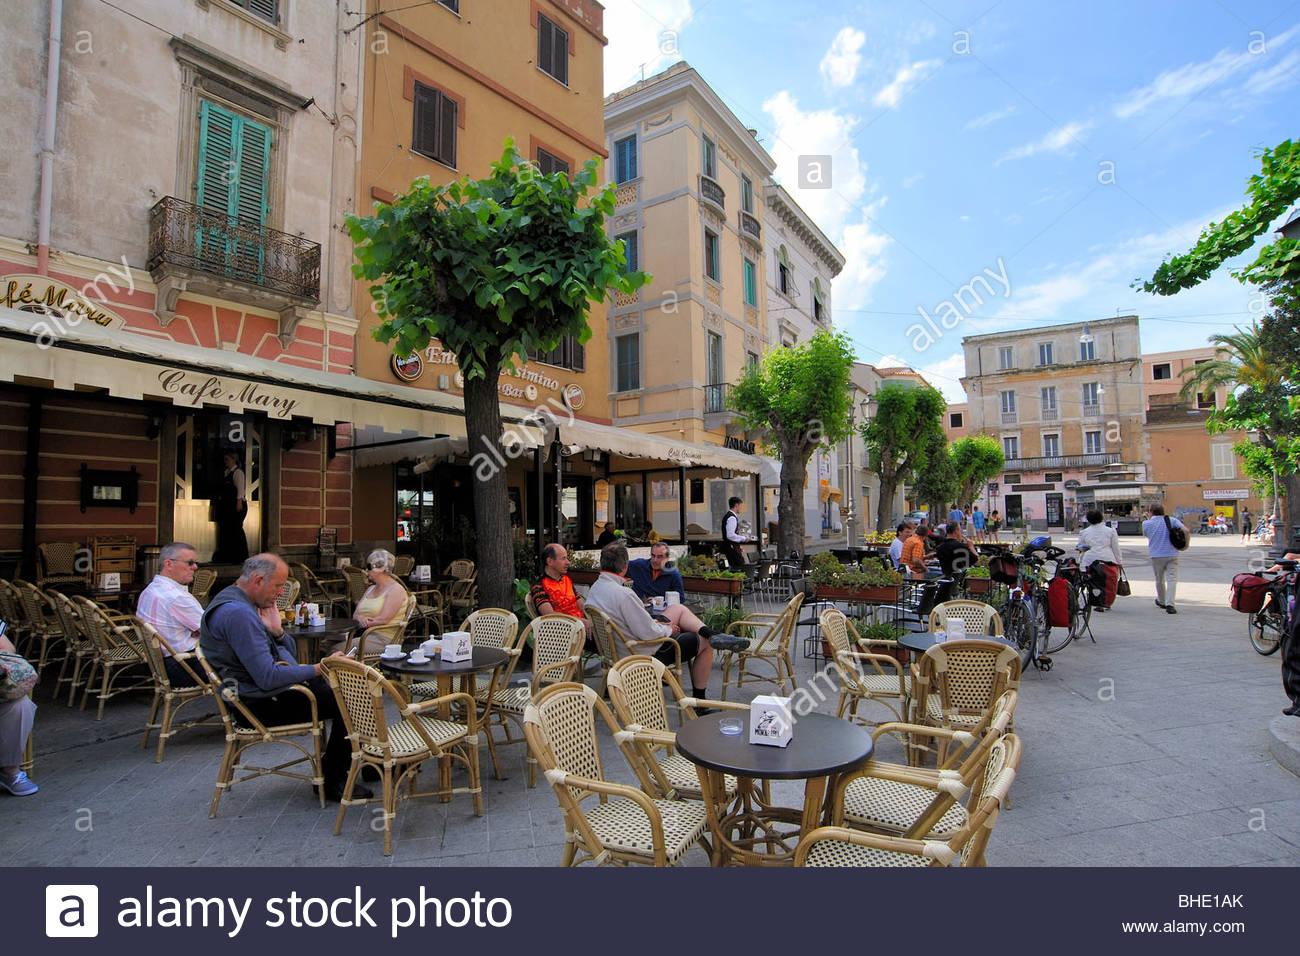 piazza regina margherita, olbia, sardinia, italy - Stock Image